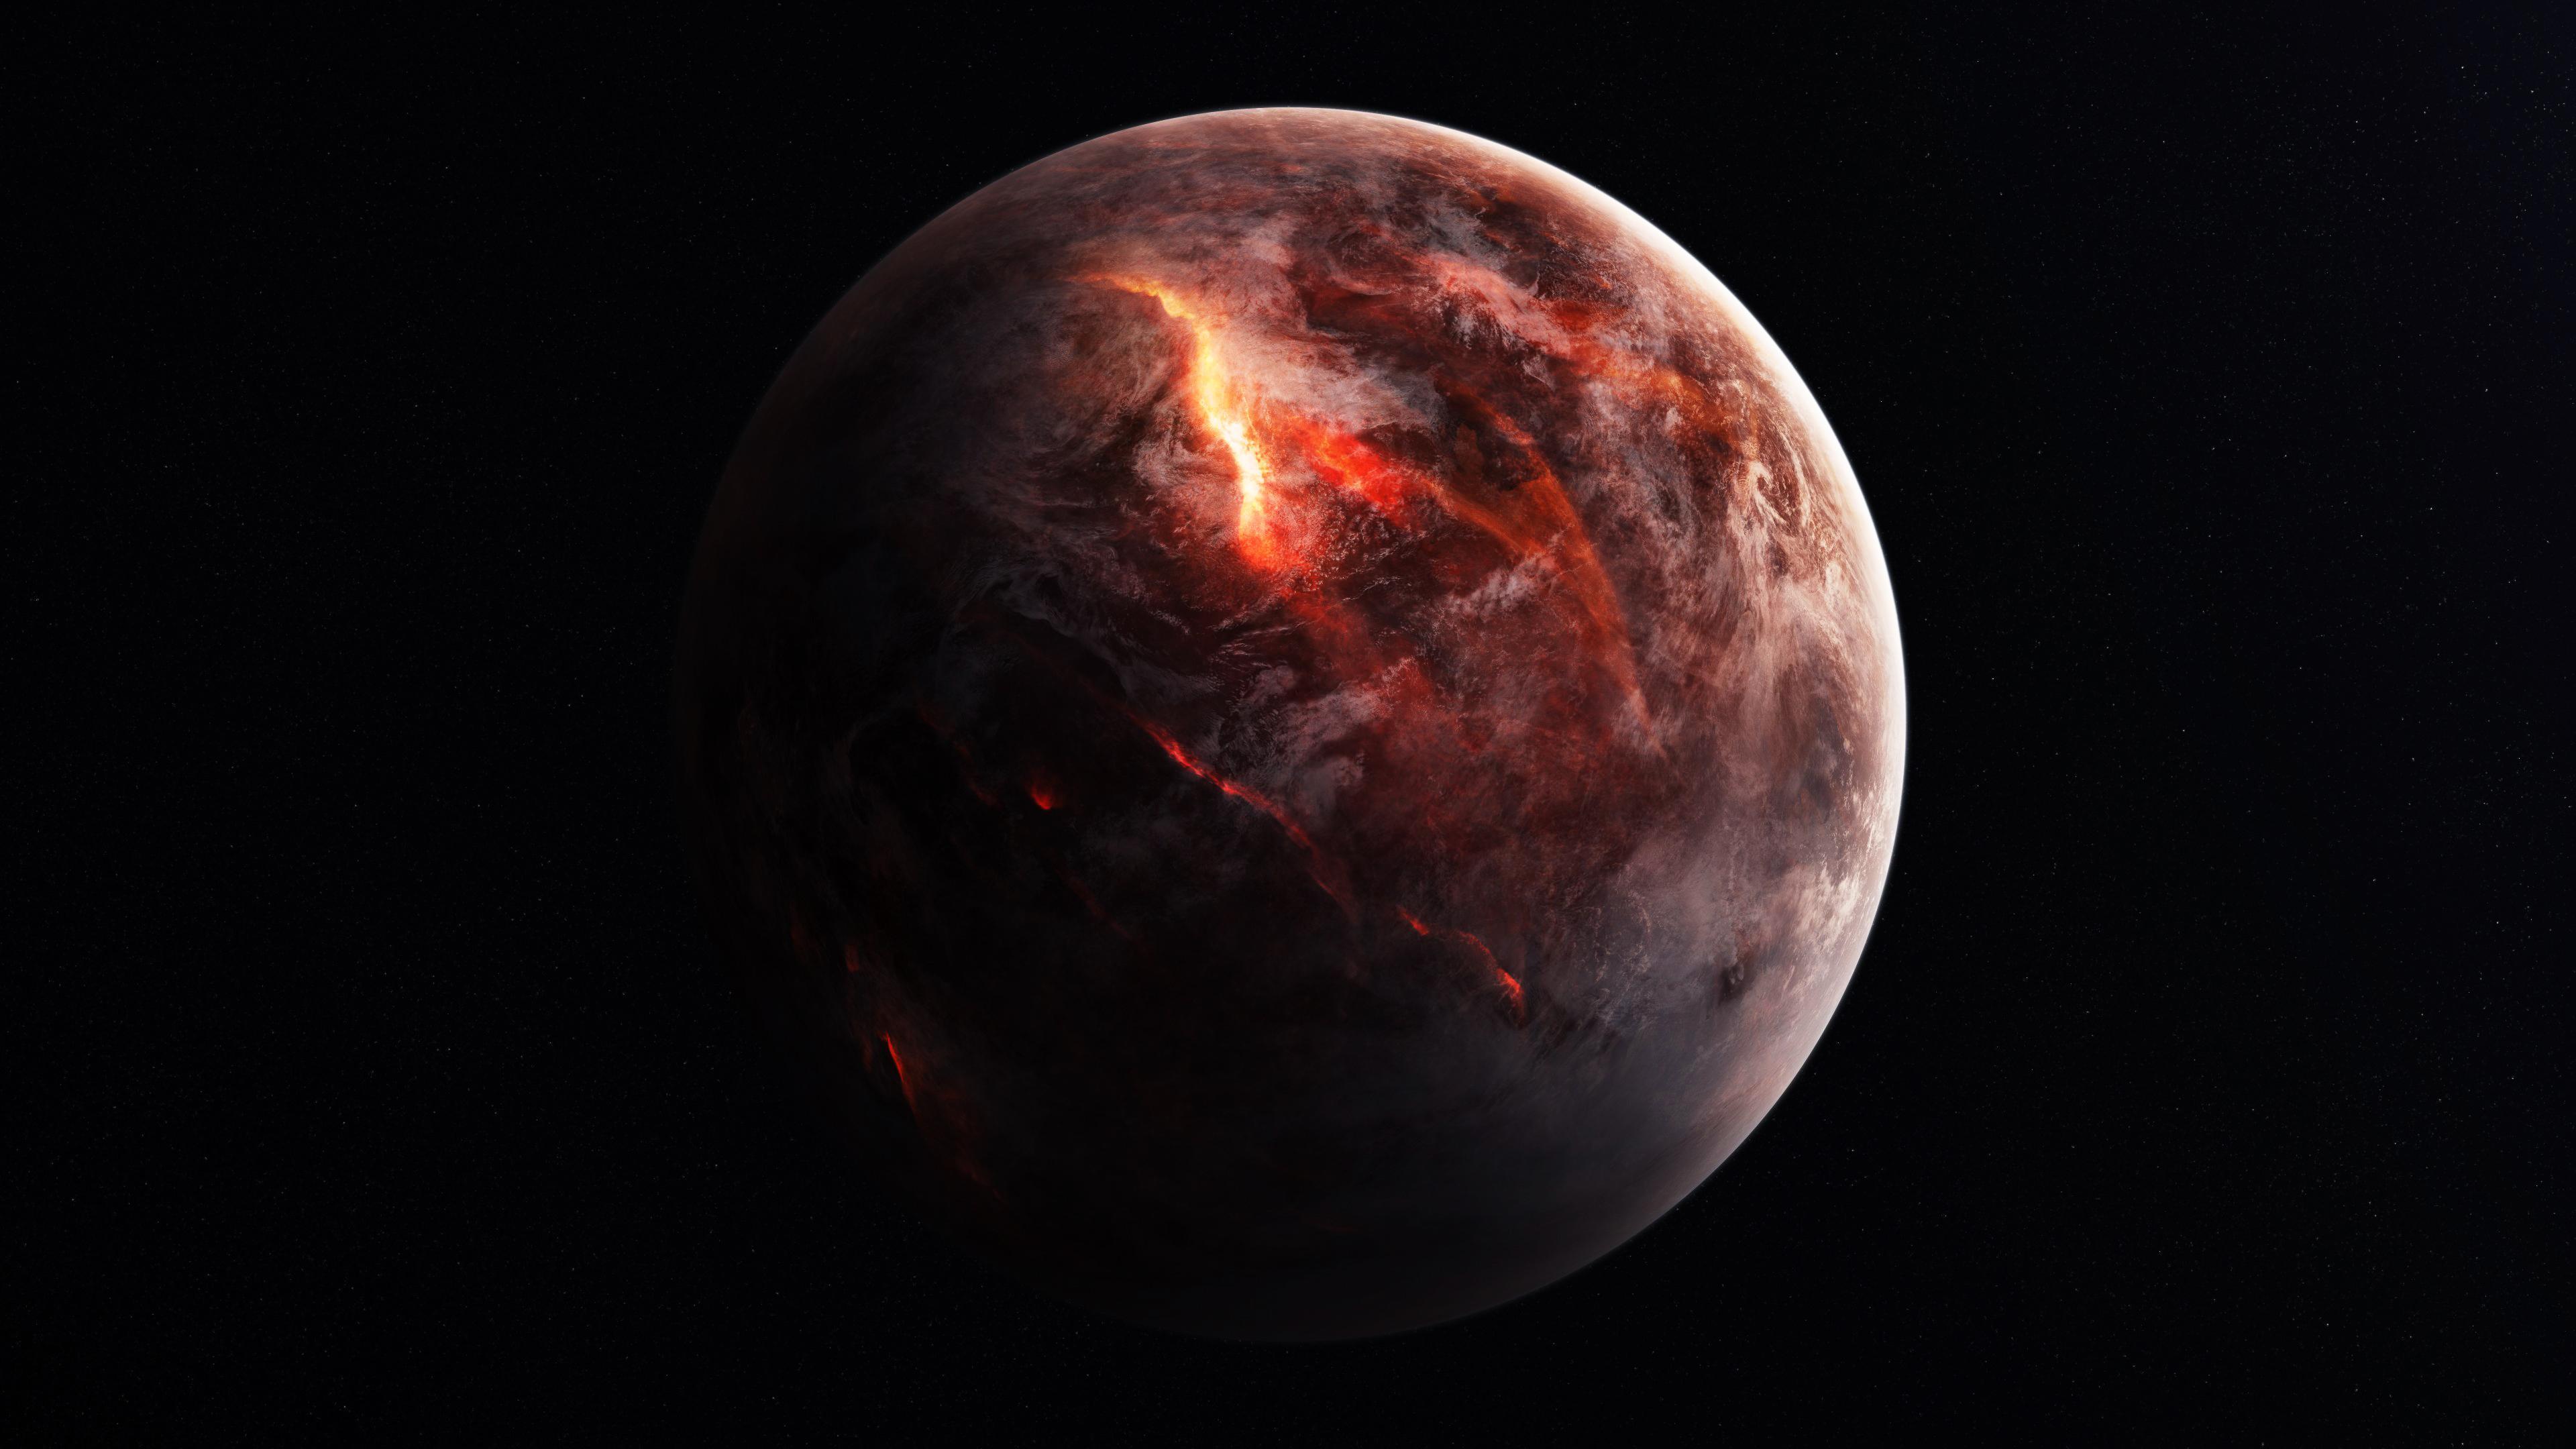 Fire Planet 4k Wallpaper